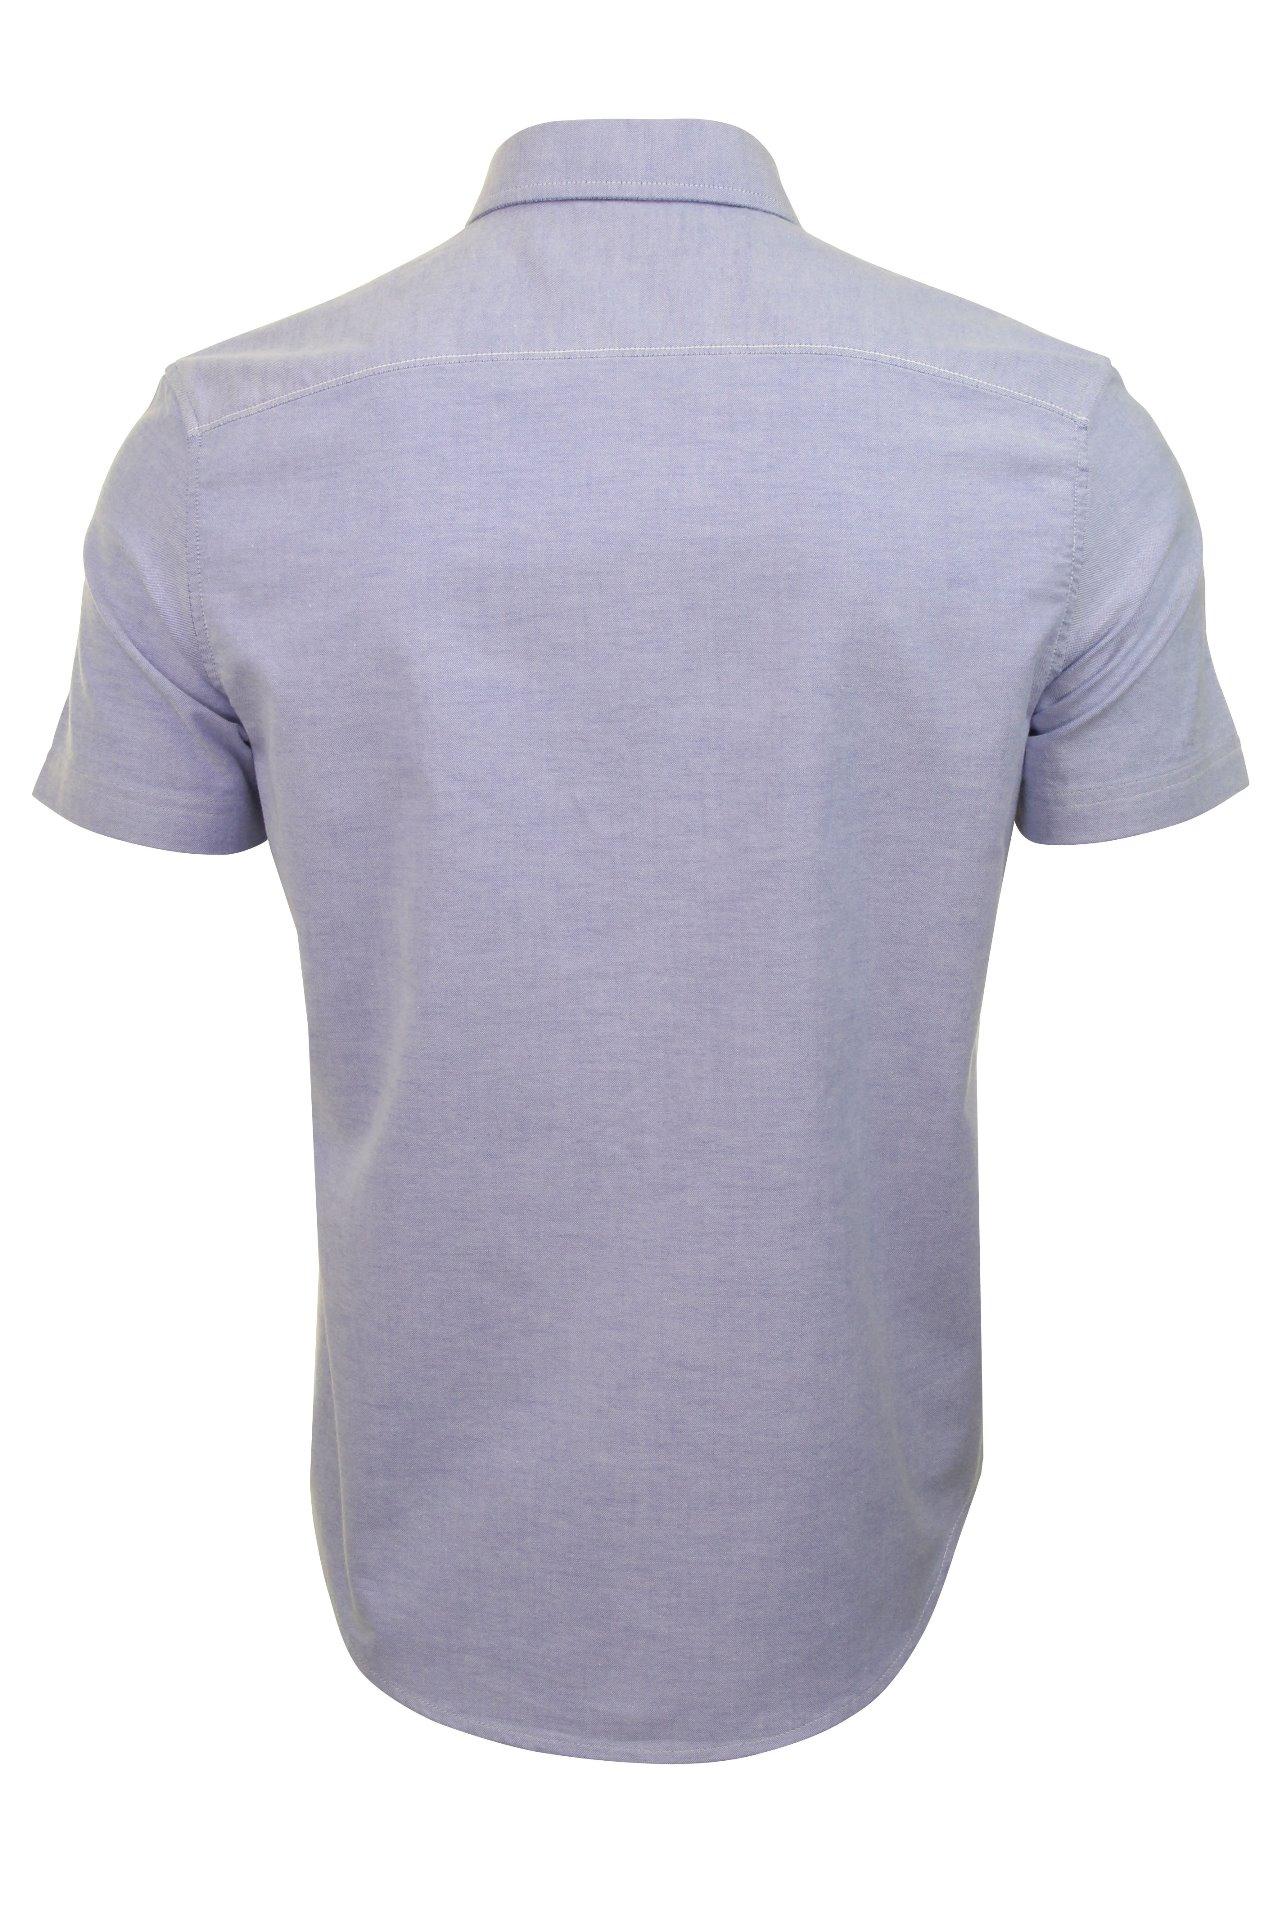 Original-Penguin-Mens-Stretch-Oxford-Shirt-Short-Sleeved thumbnail 5